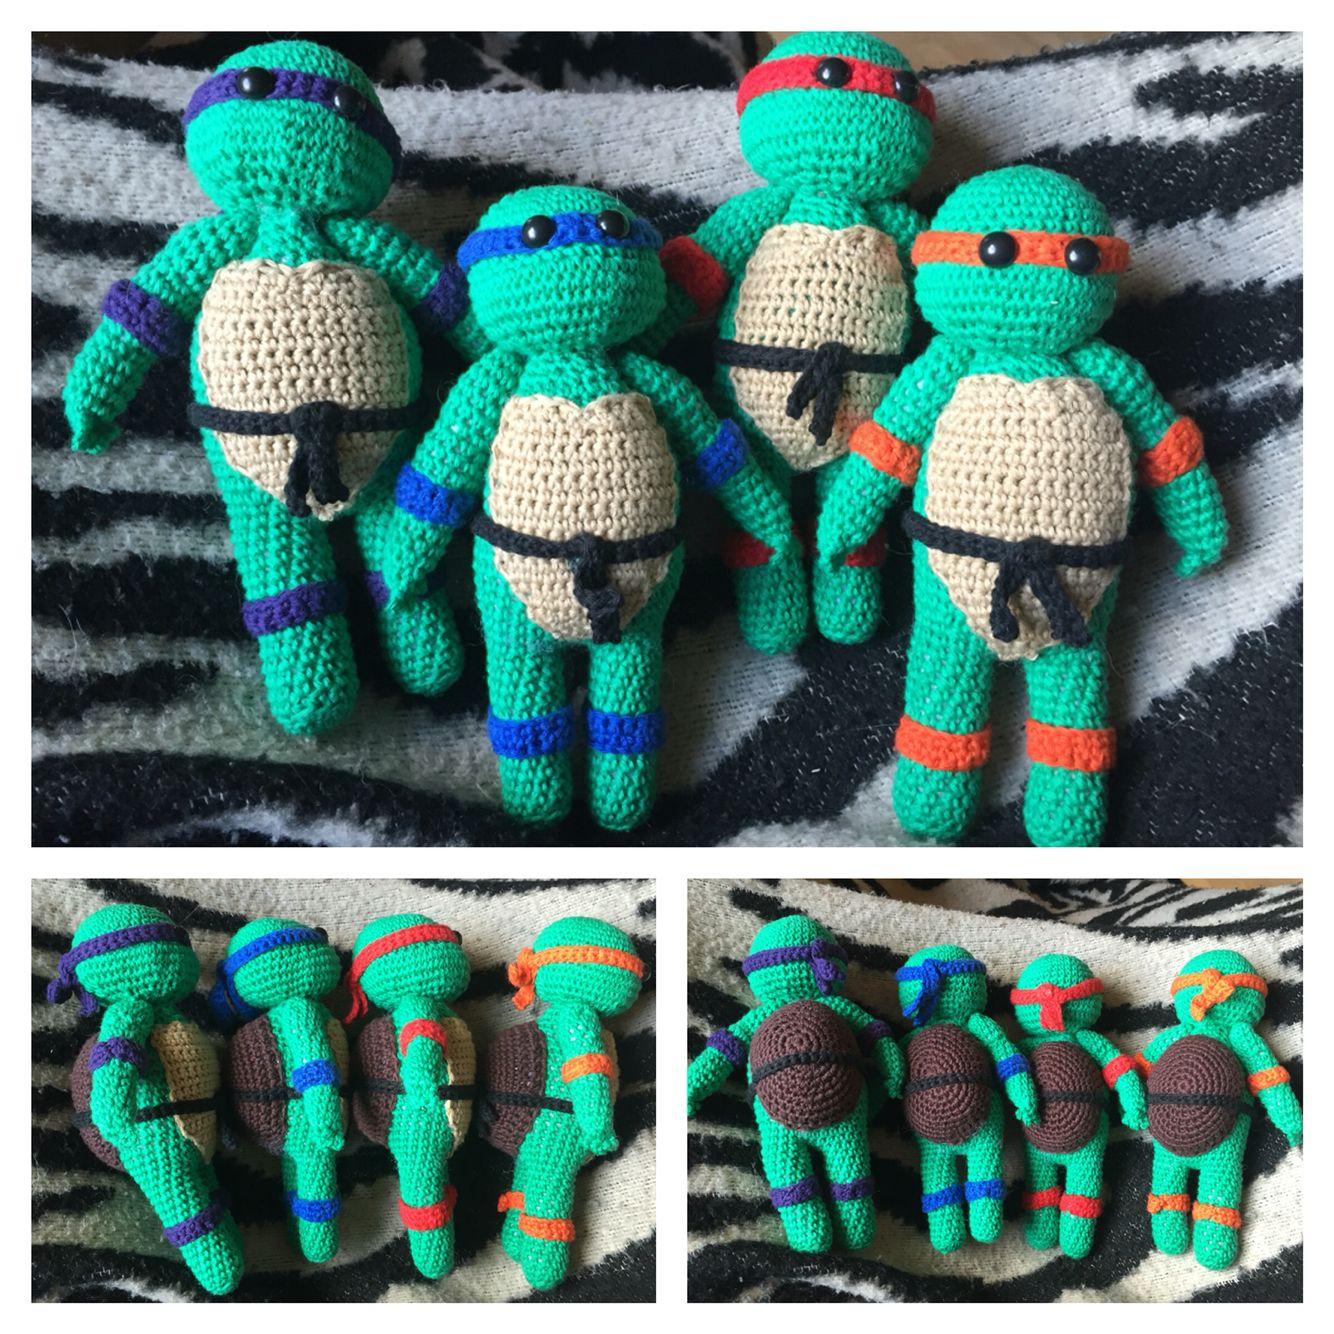 Hæklede Ninja Turtles   Mine hæklerier   Pinterest